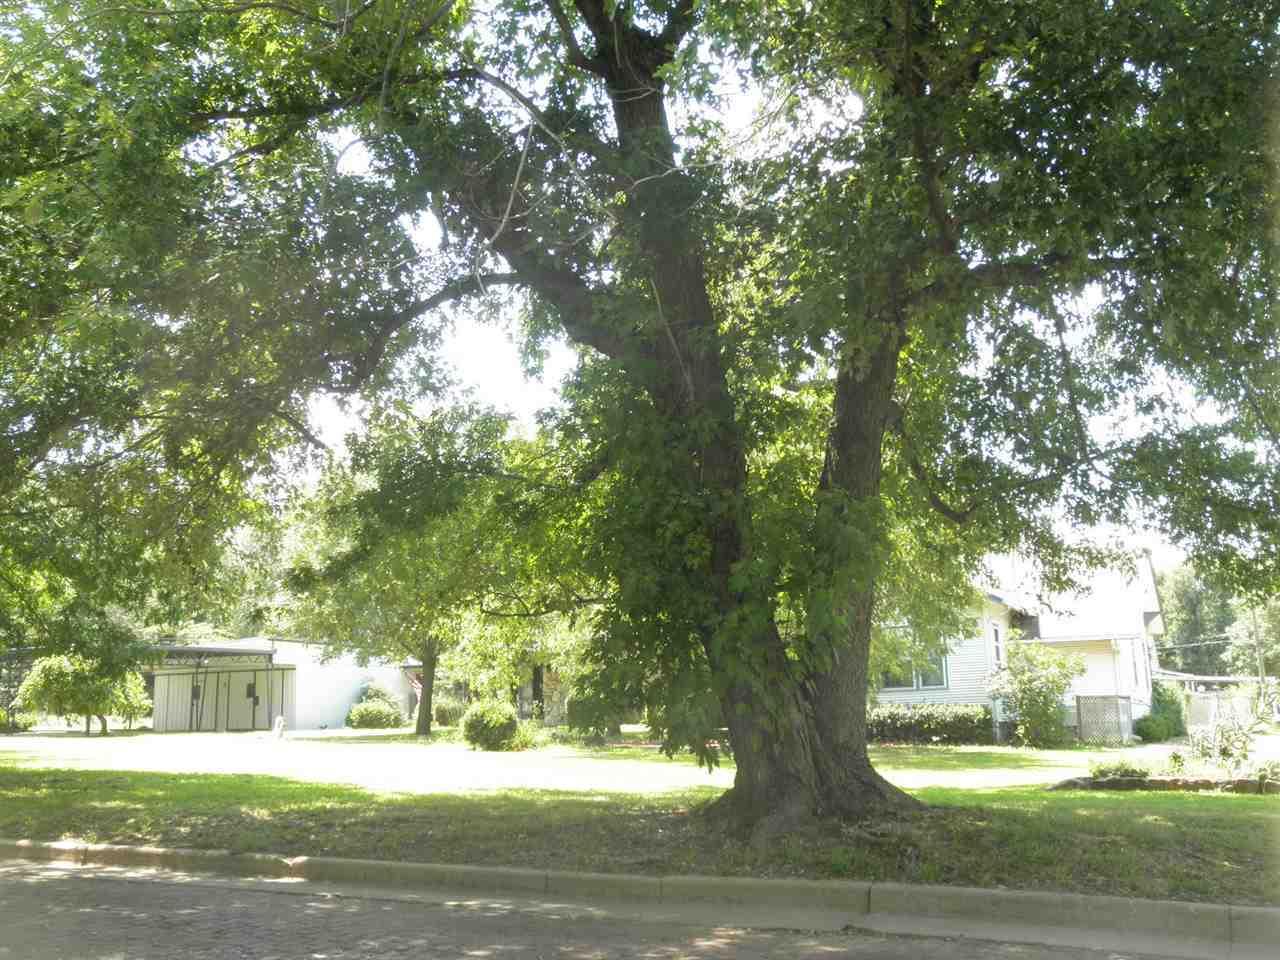 #century21groupone,#homesforsaleponcacity,#poncacityrealestate | 840 N Birch  Ponca City, OK 74601 2